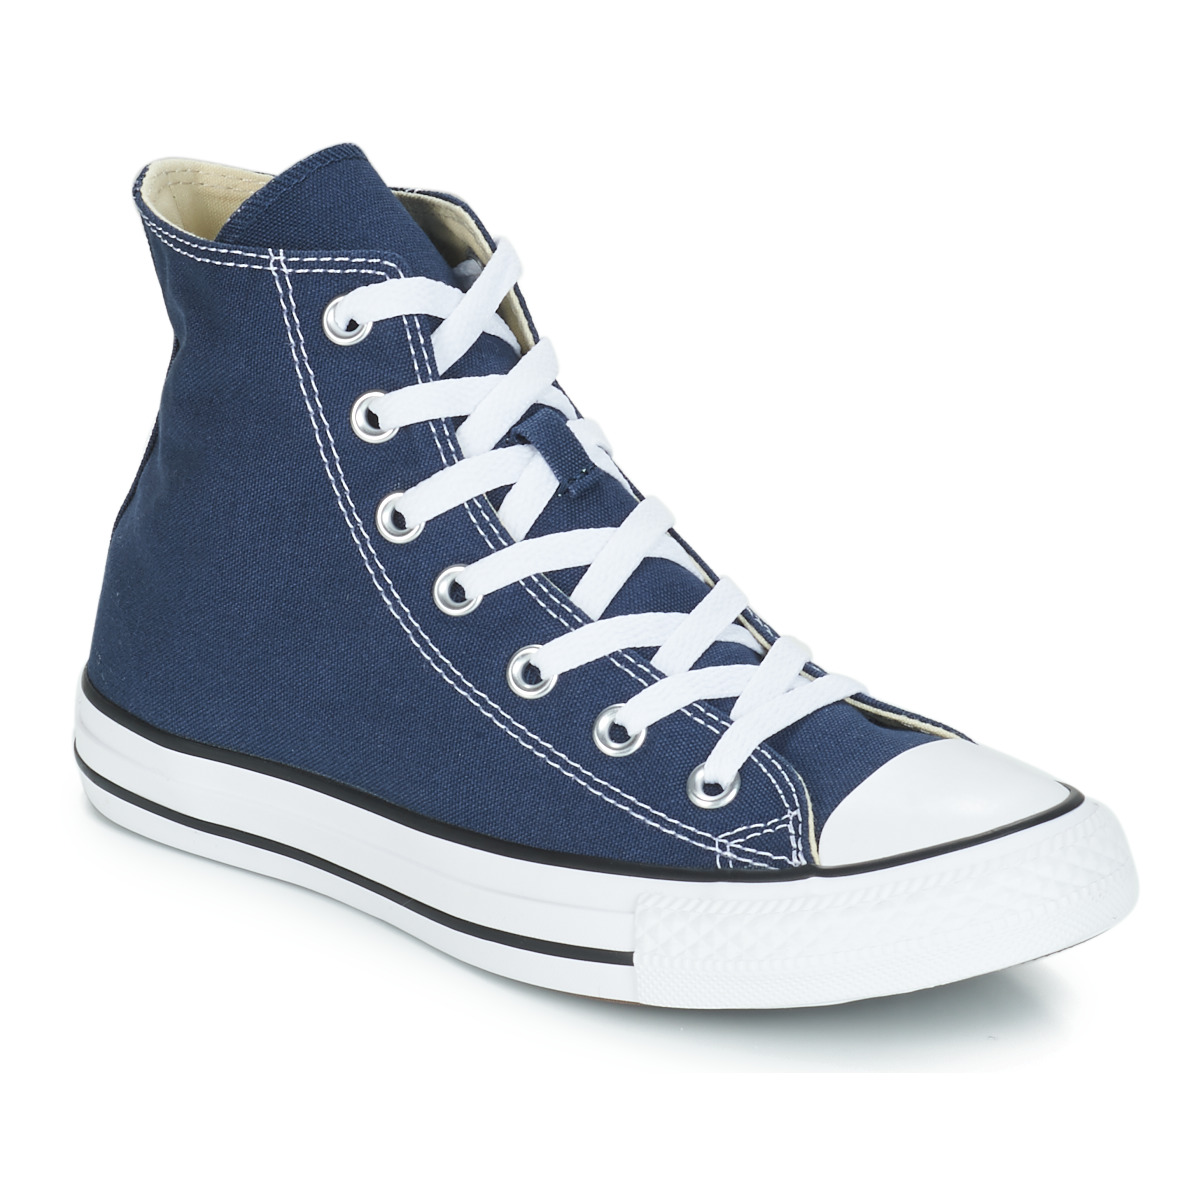 Converse ALL STAR CORE HI Navy